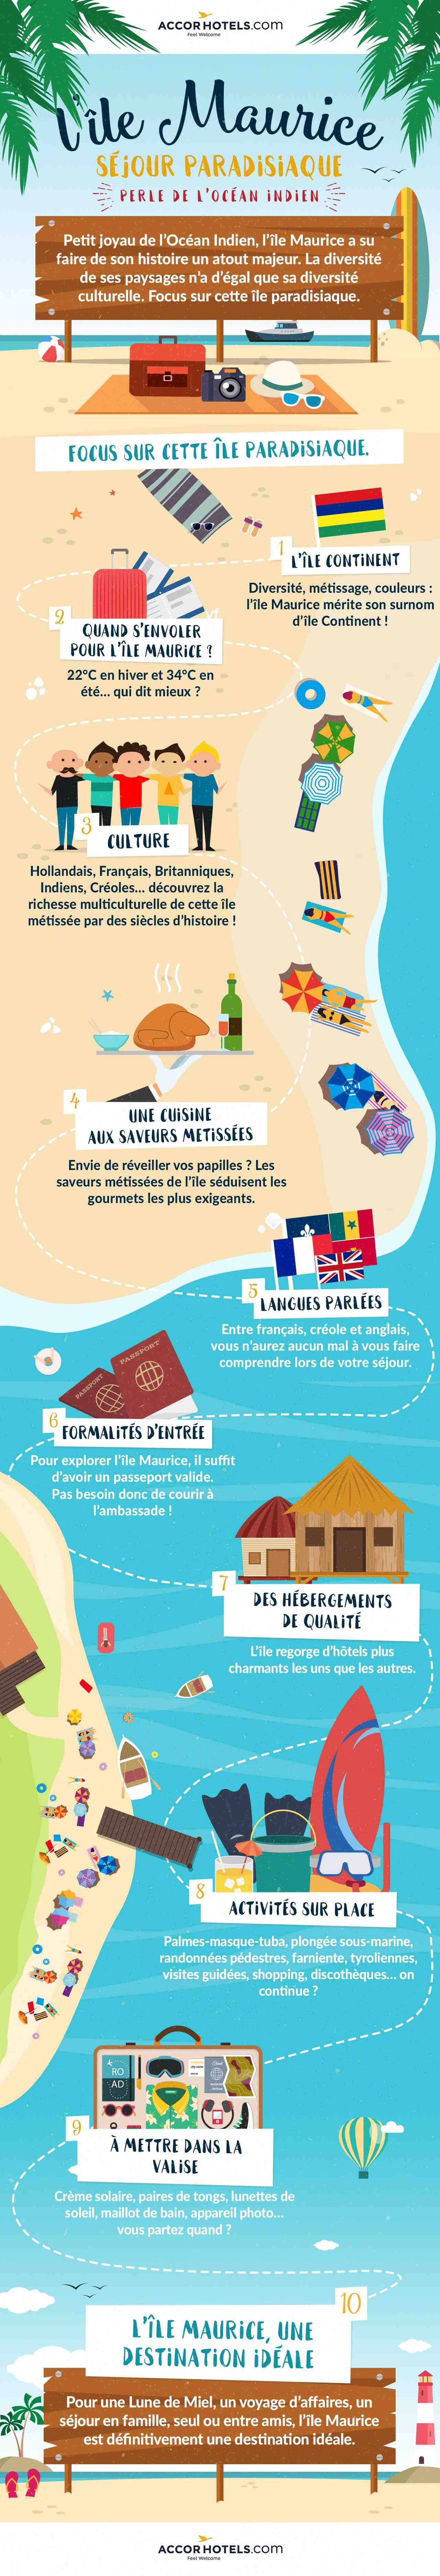 infographie maurice